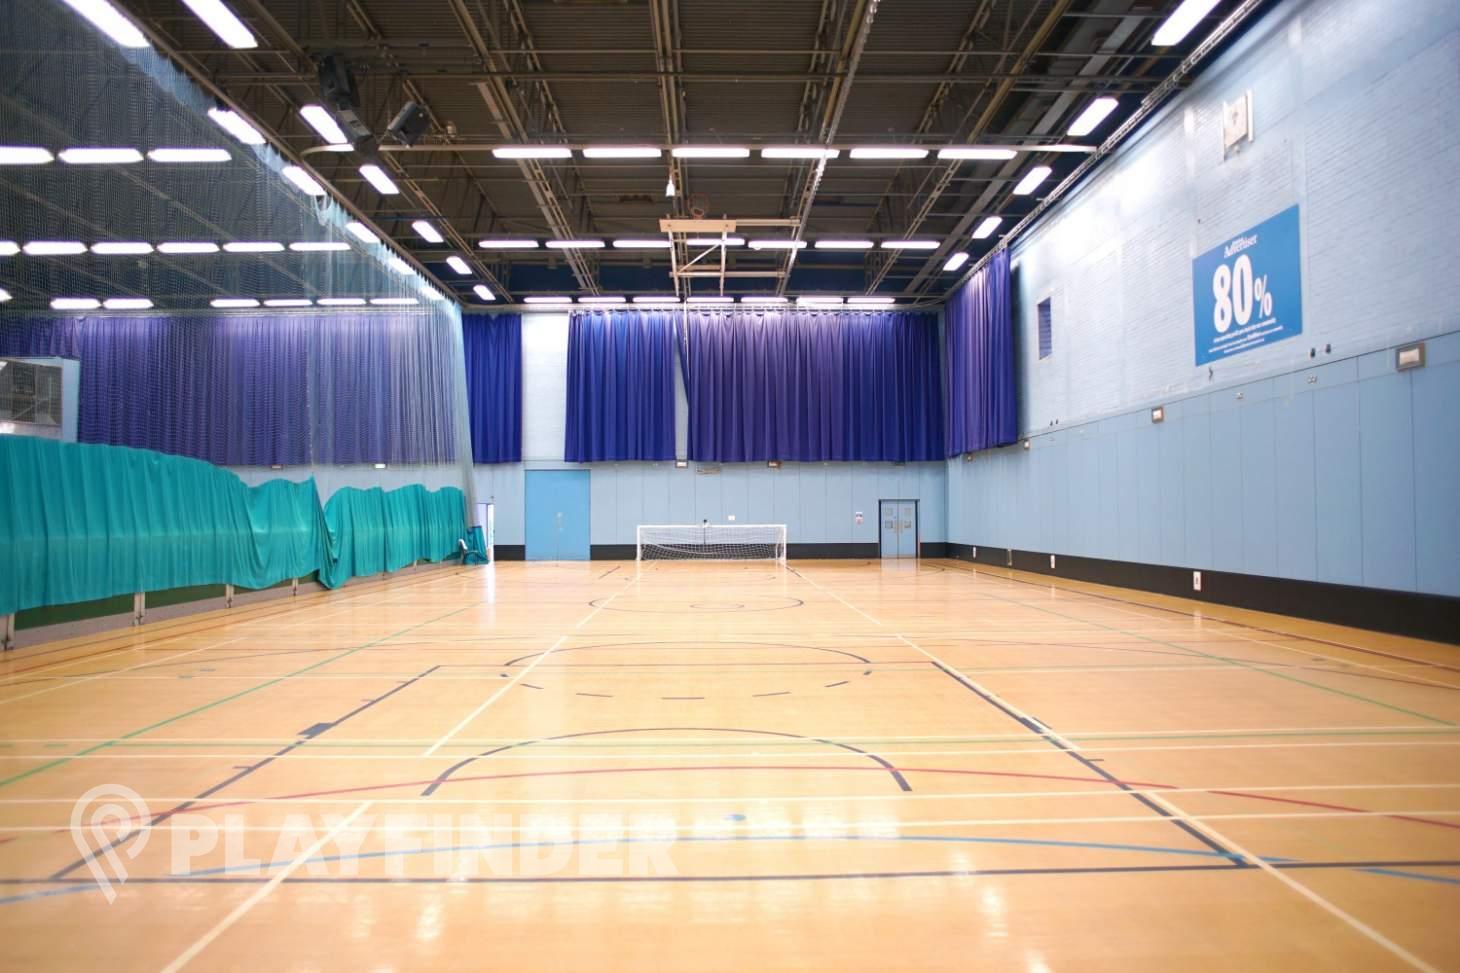 Magnet Leisure Centre Indoor basketball court